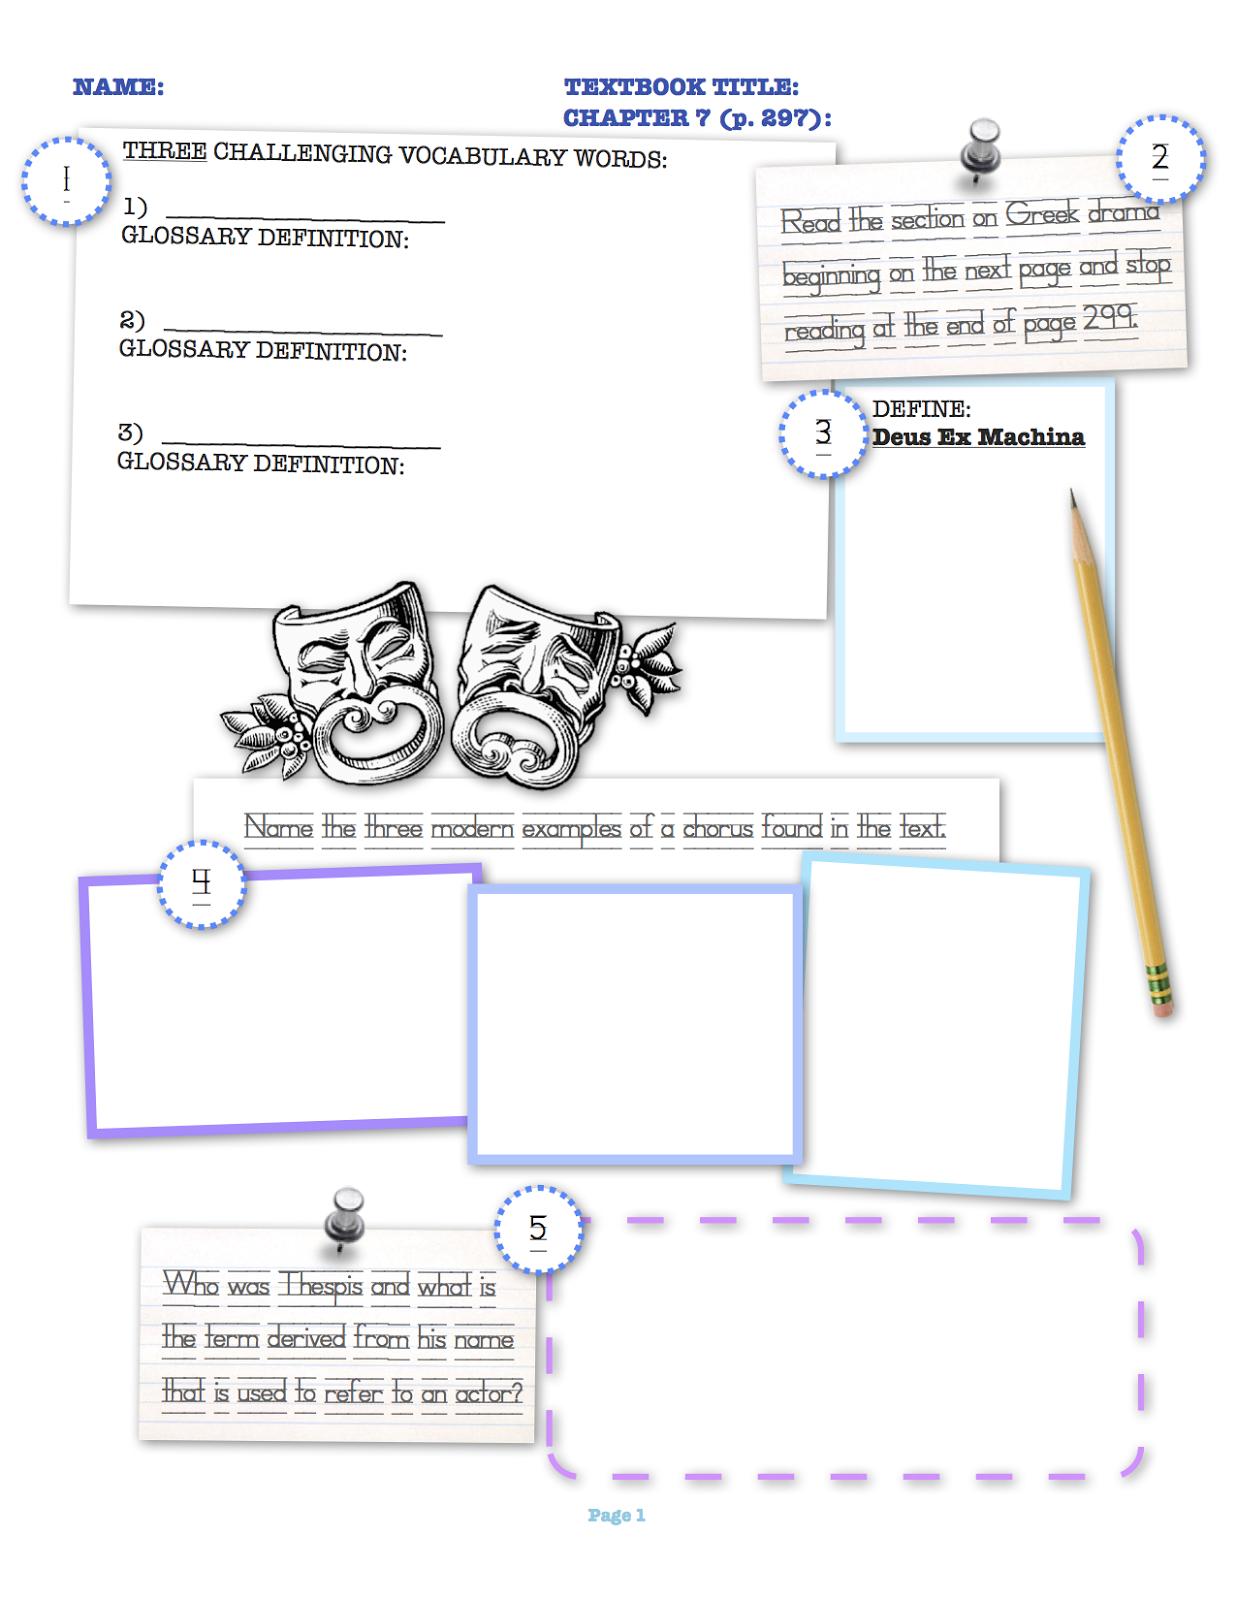 Theatre Worksheets Rupsucks Printables Worksheets – Theatre Worksheets